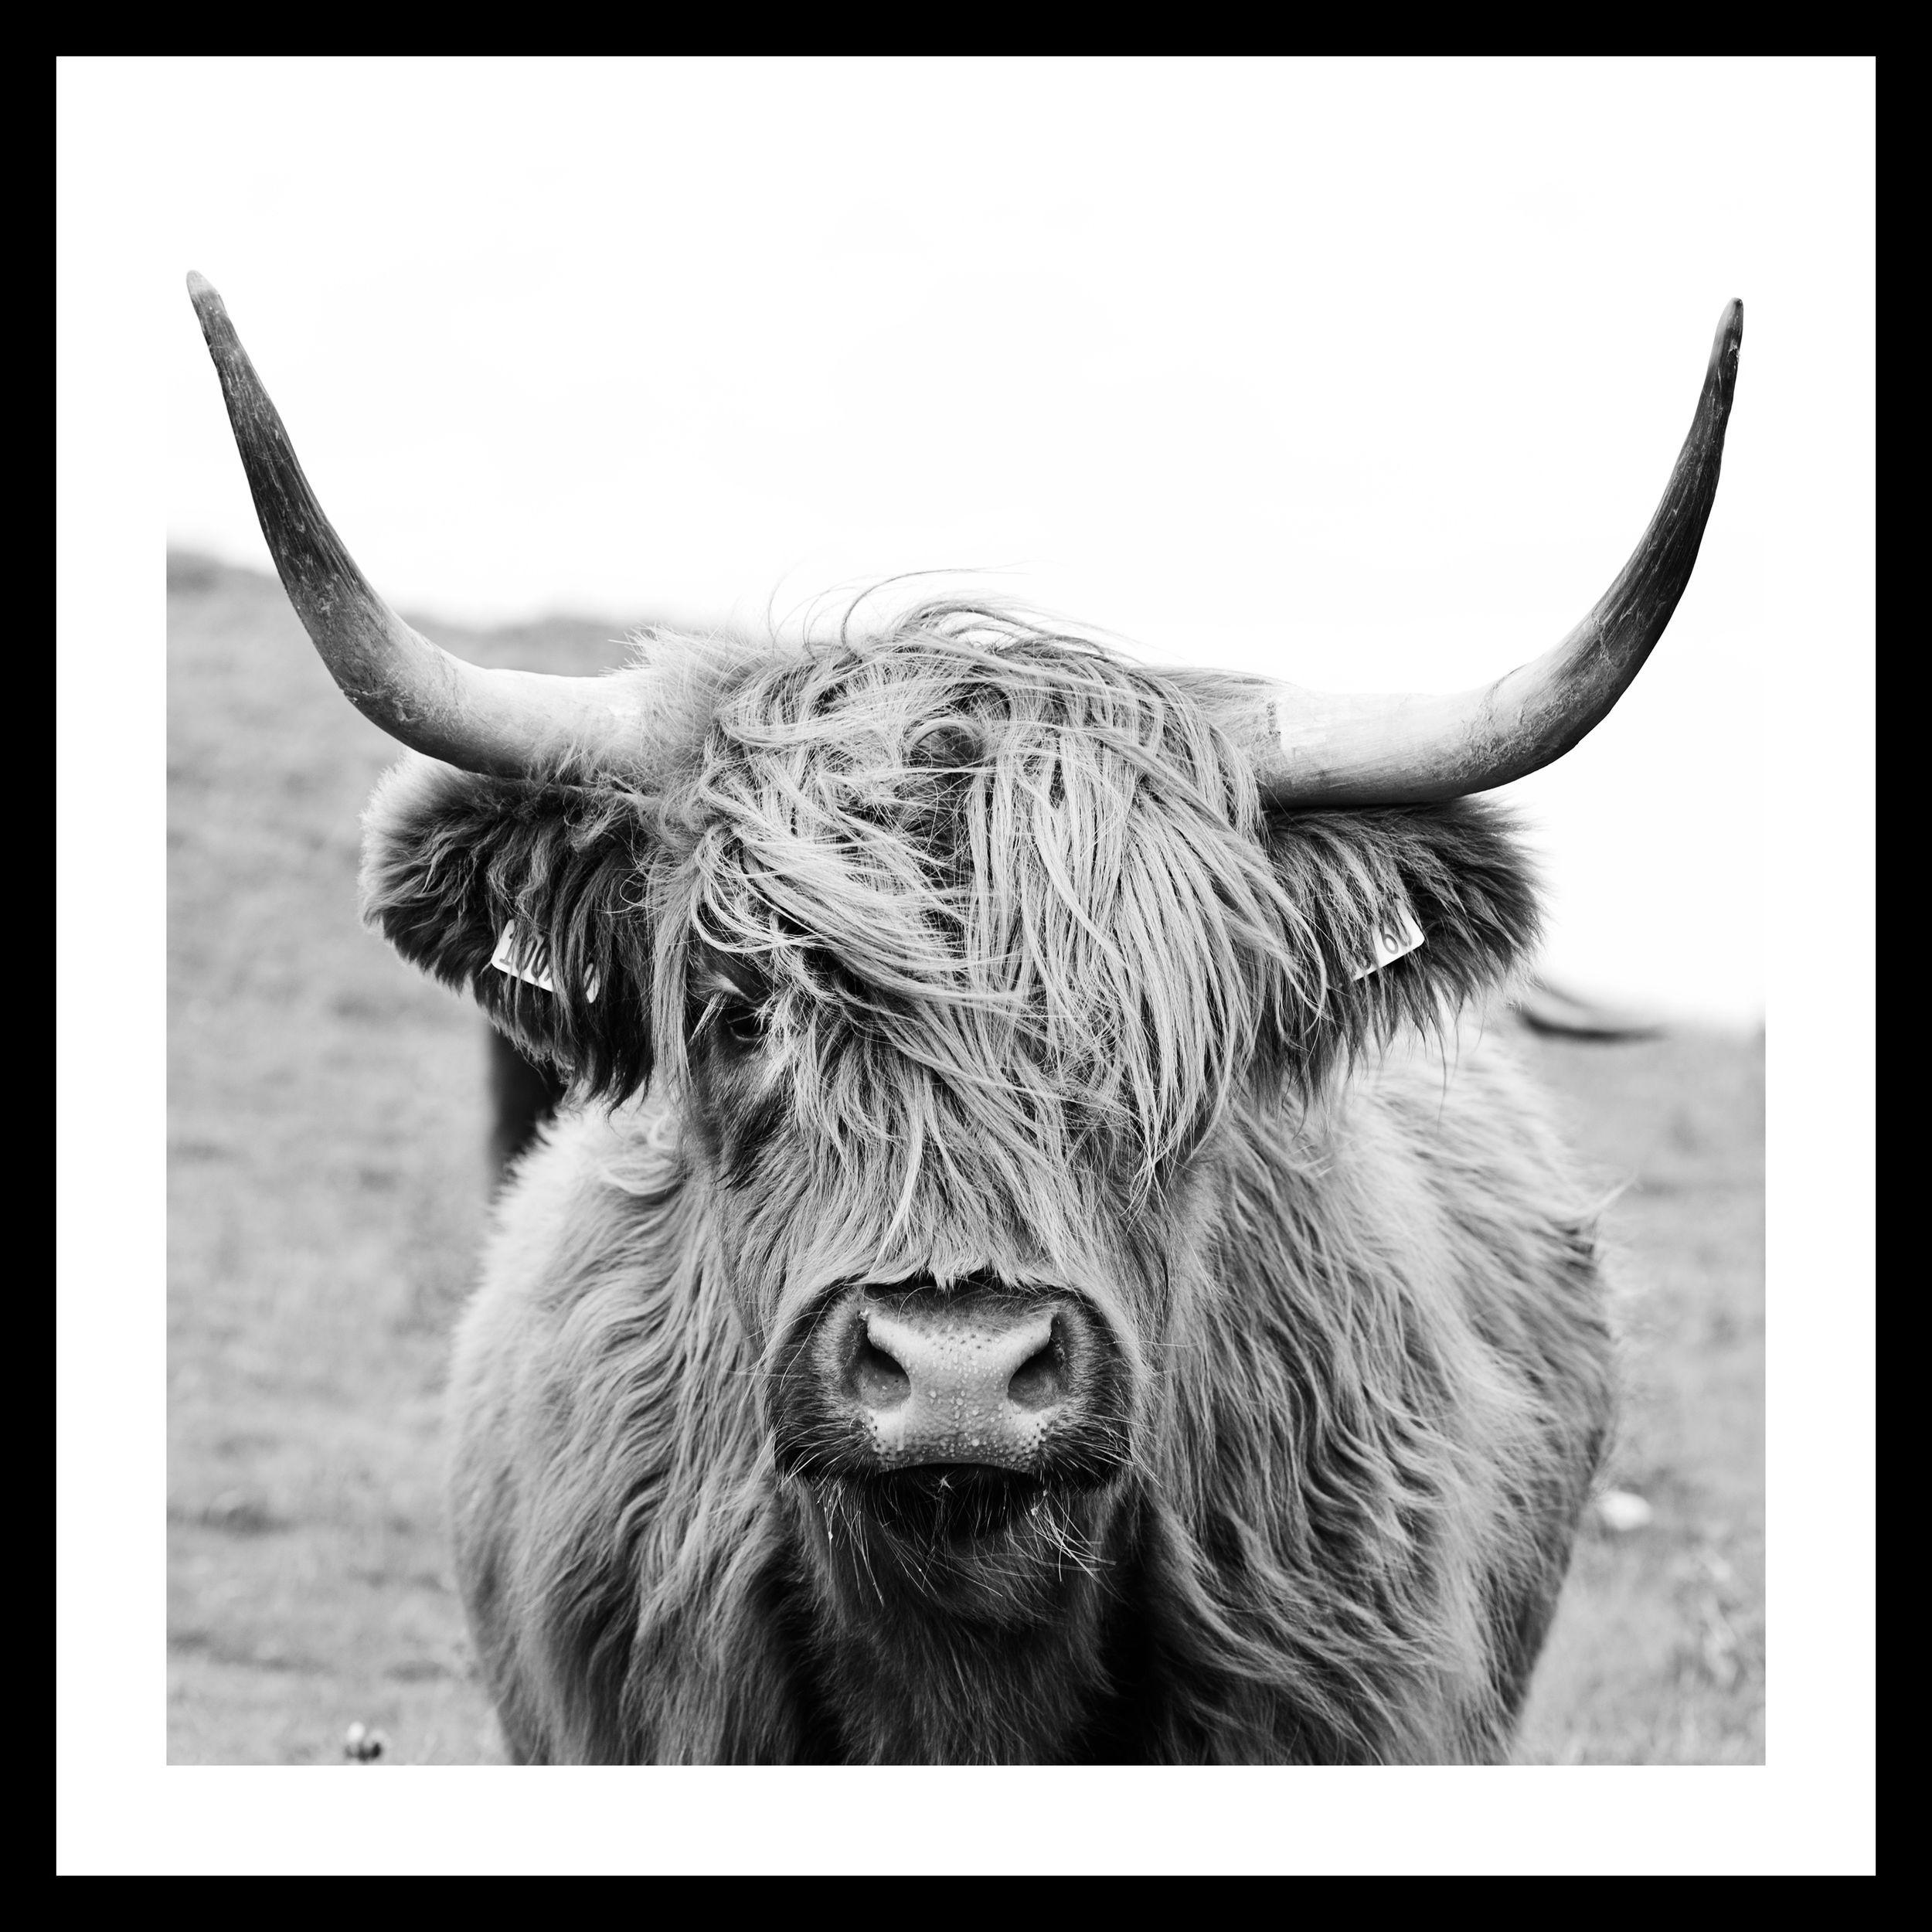 Druck gerahmt 35x35cm DANJA, COW